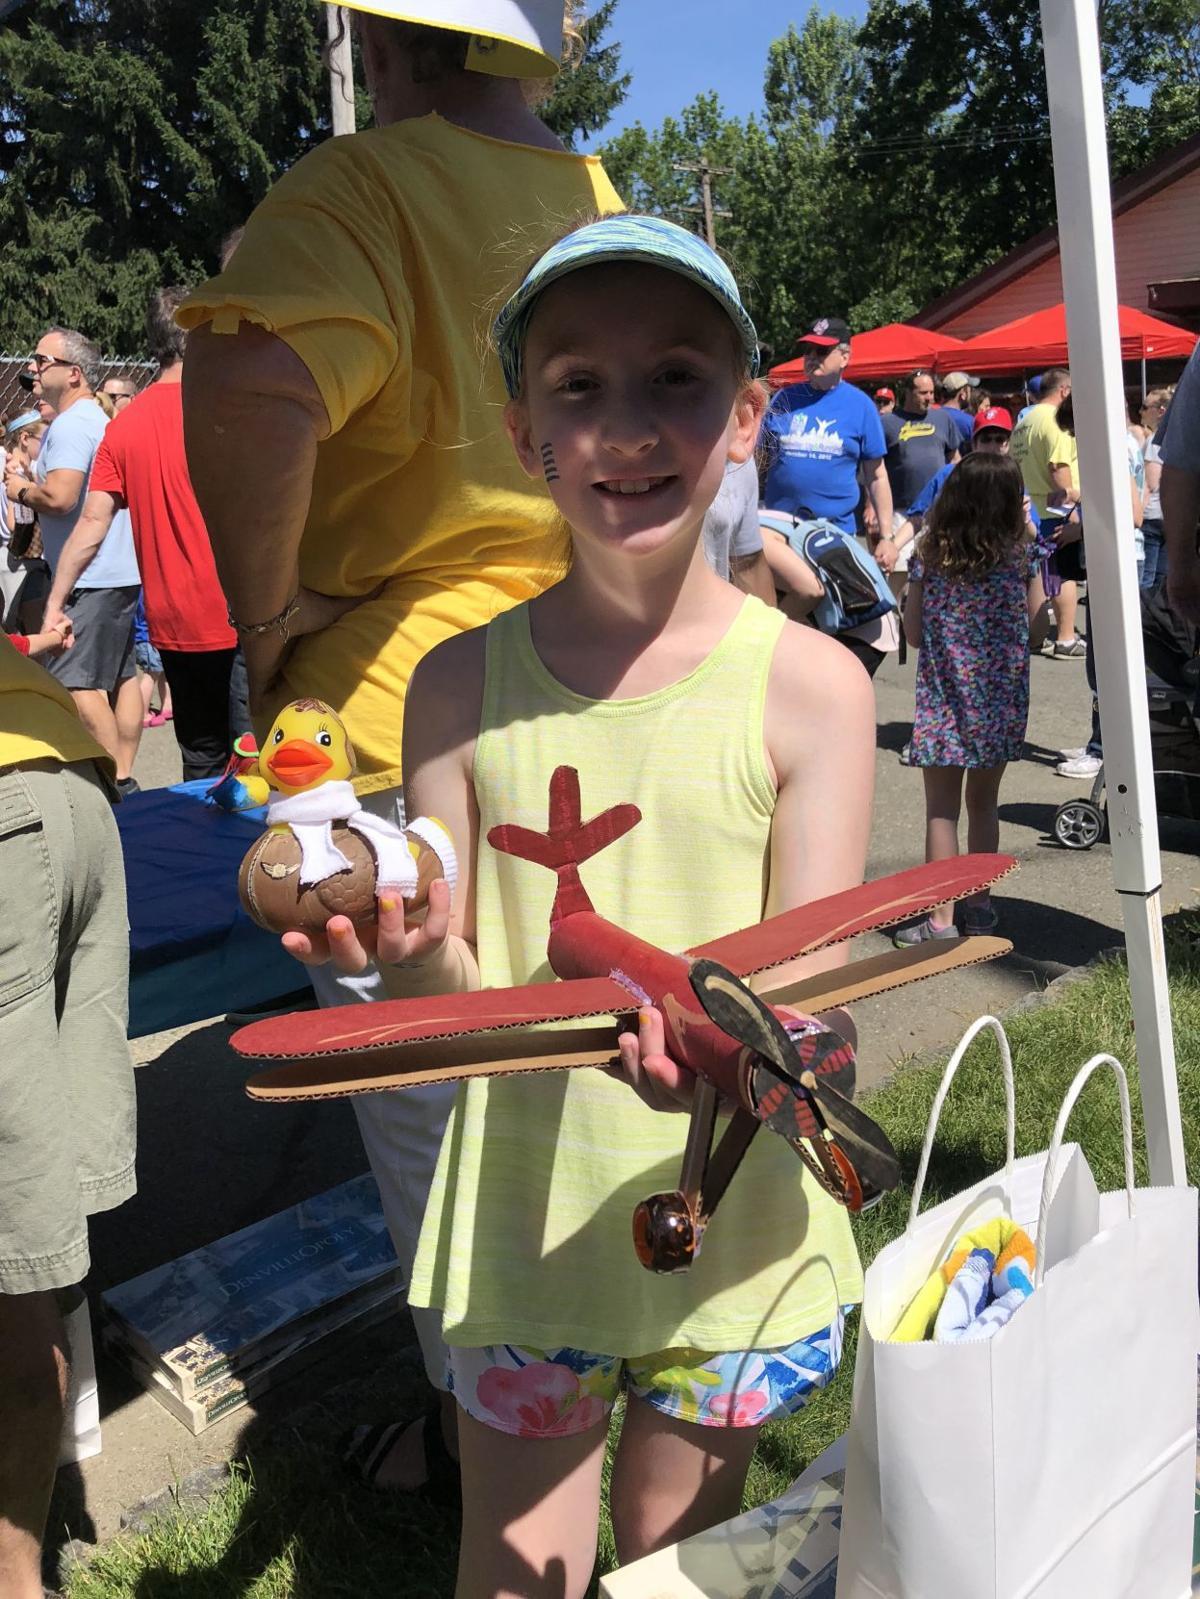 (VIDEO) Hundreds of rubber ducks race in Denville's annual event